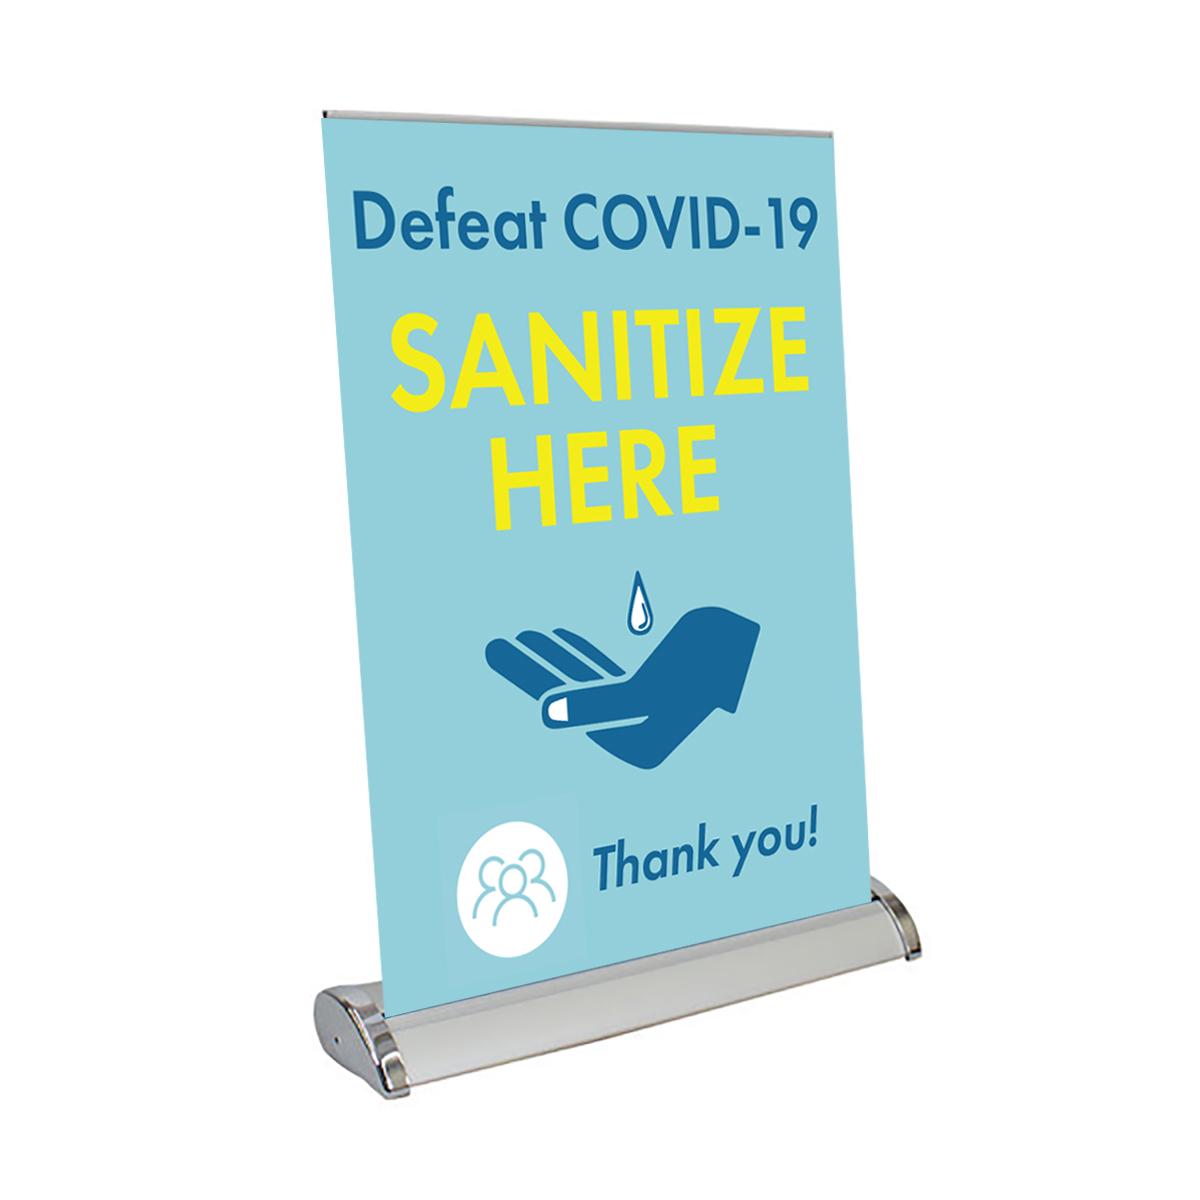 "Defeat COVID-19 - 13"" x 17"" Table Top Mini Retractable Banner"